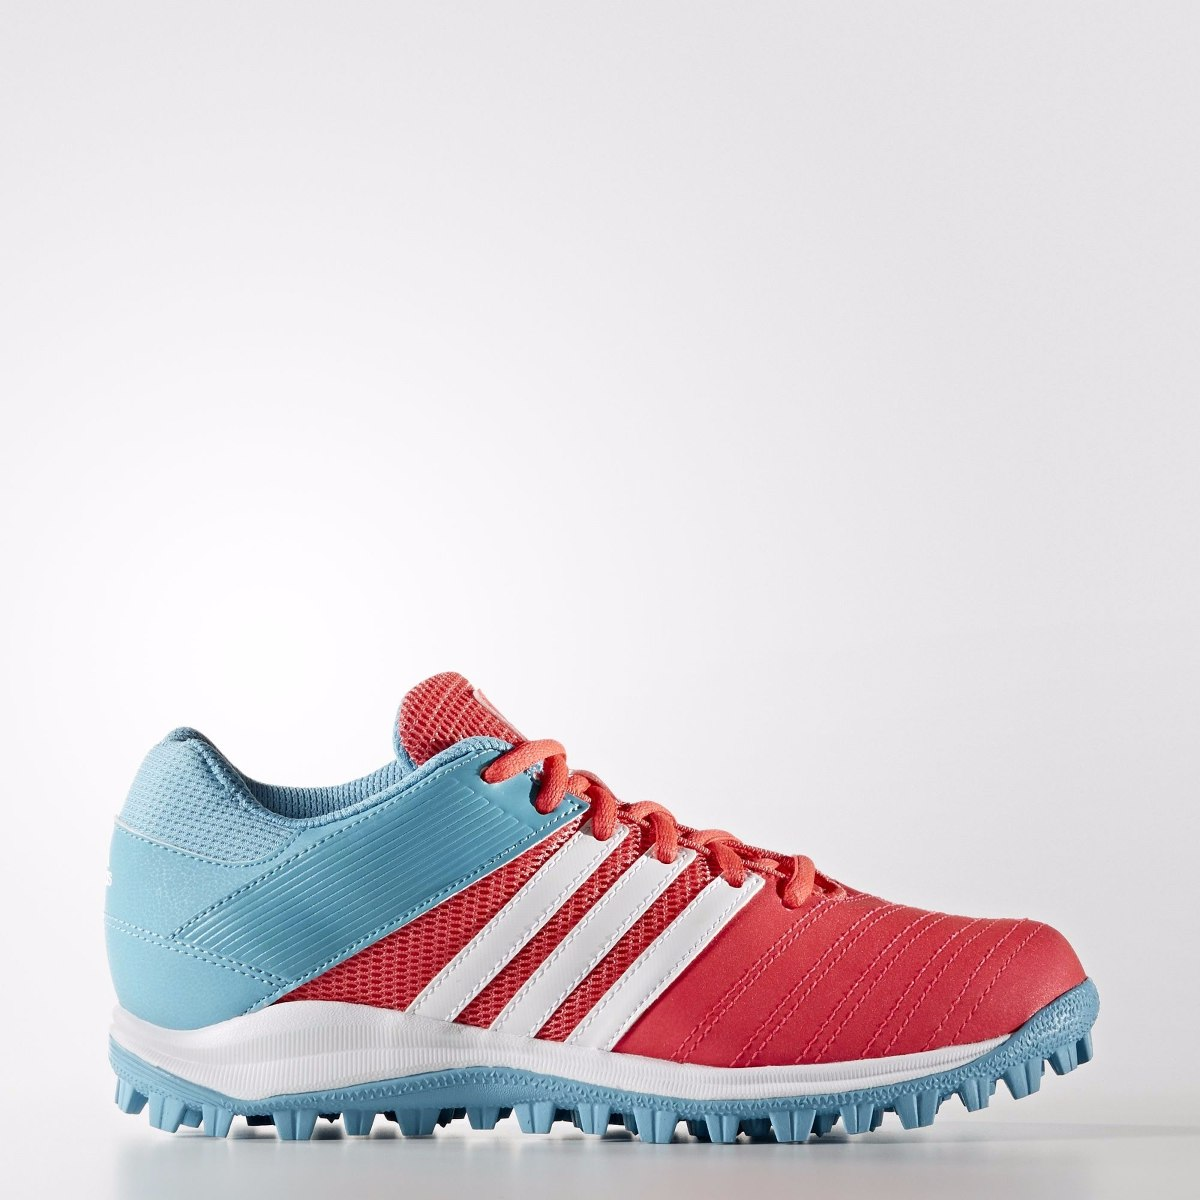 sports shoes 96417 8d958 Cargando zoom... botines adidas de hockey srs 4 w mujer ...